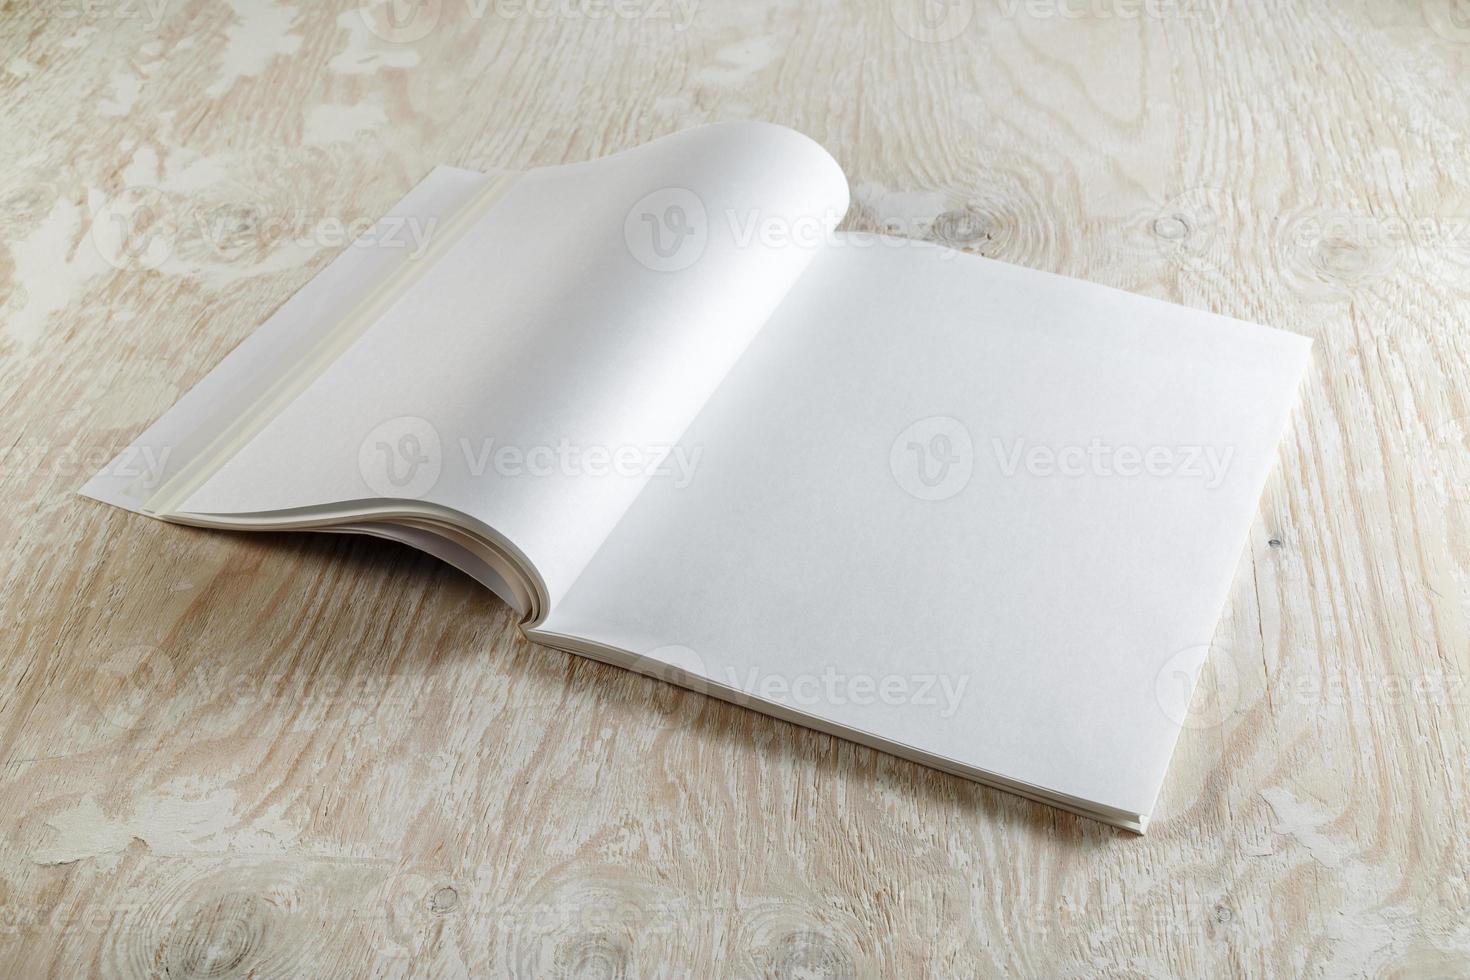 brochura aberta em branco foto